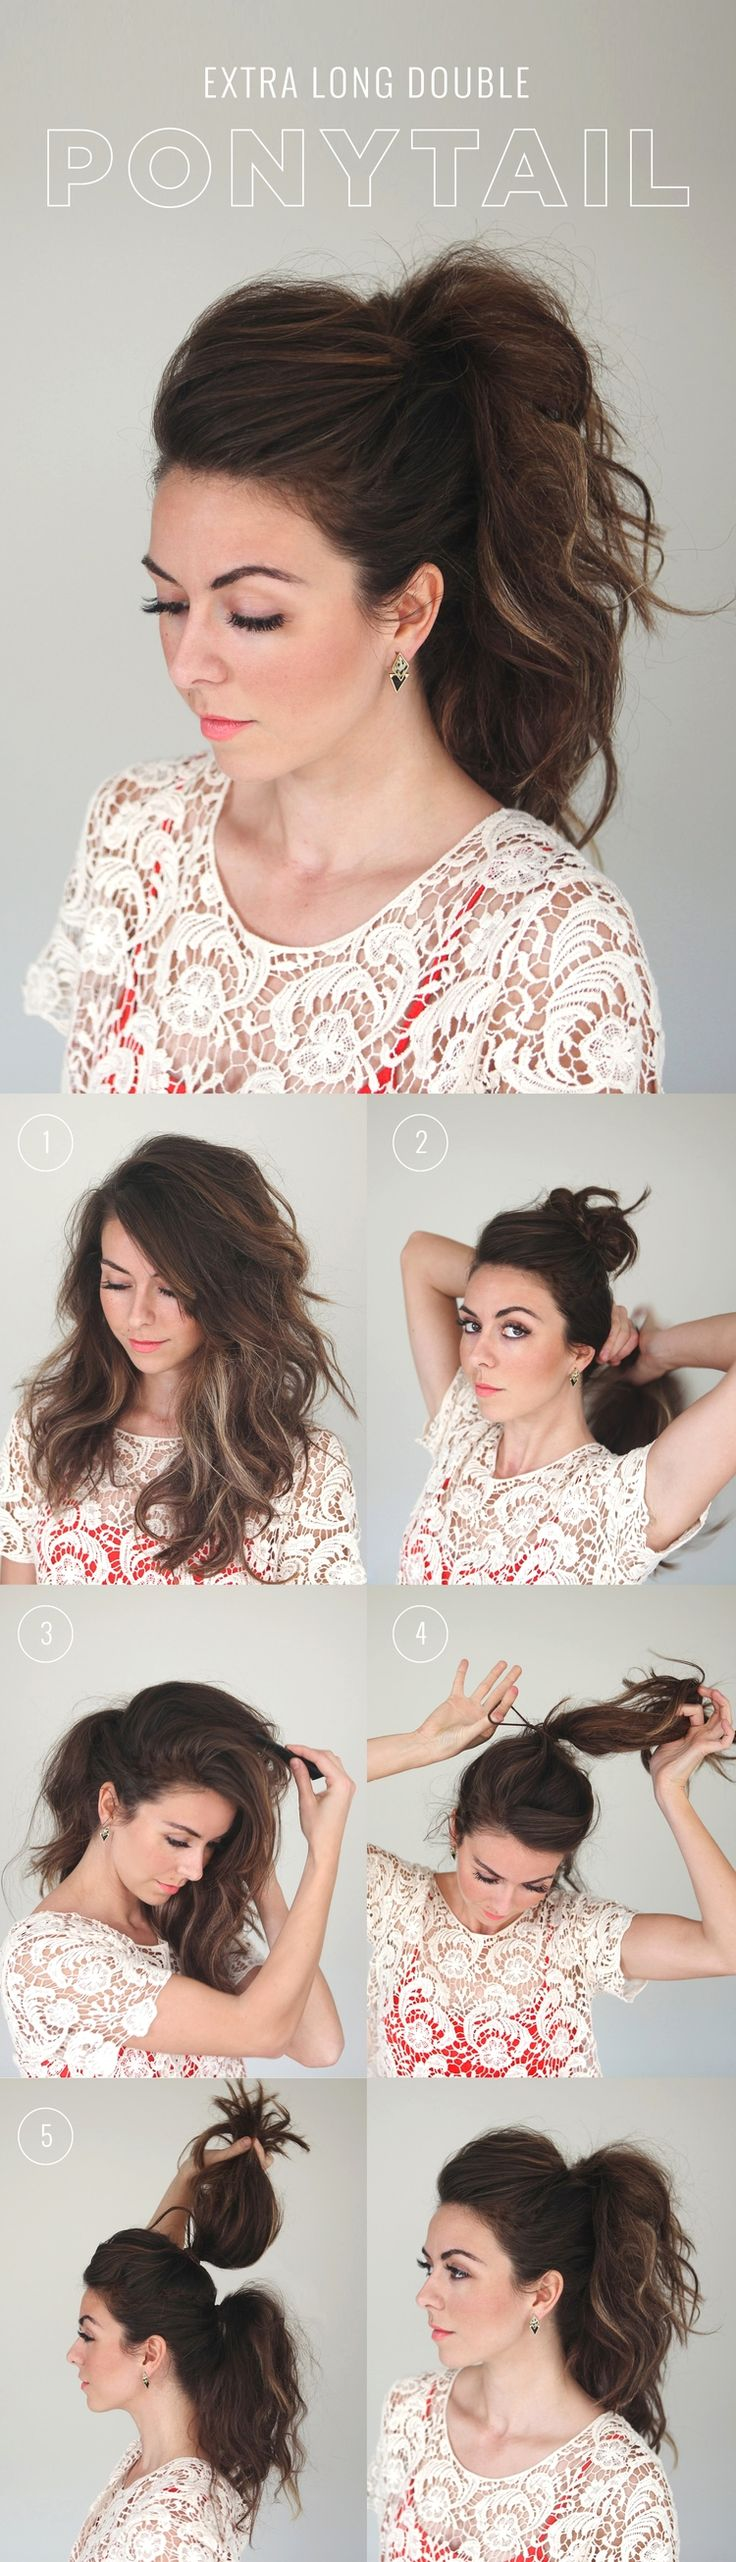 double ponytail